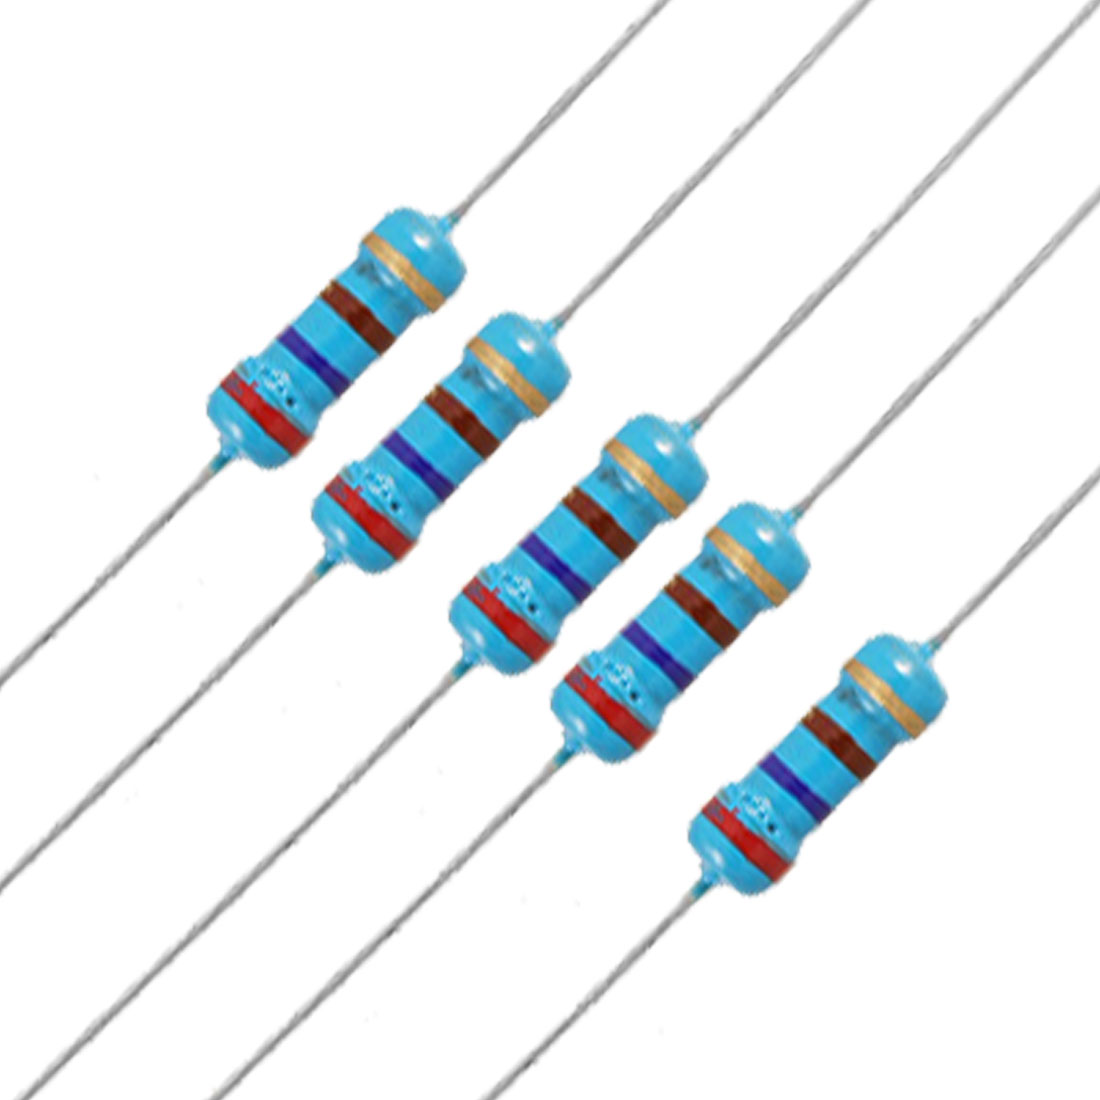 20 x 1/2W Watt 270 ohm 270R Carbon Film Resistor 0.5W